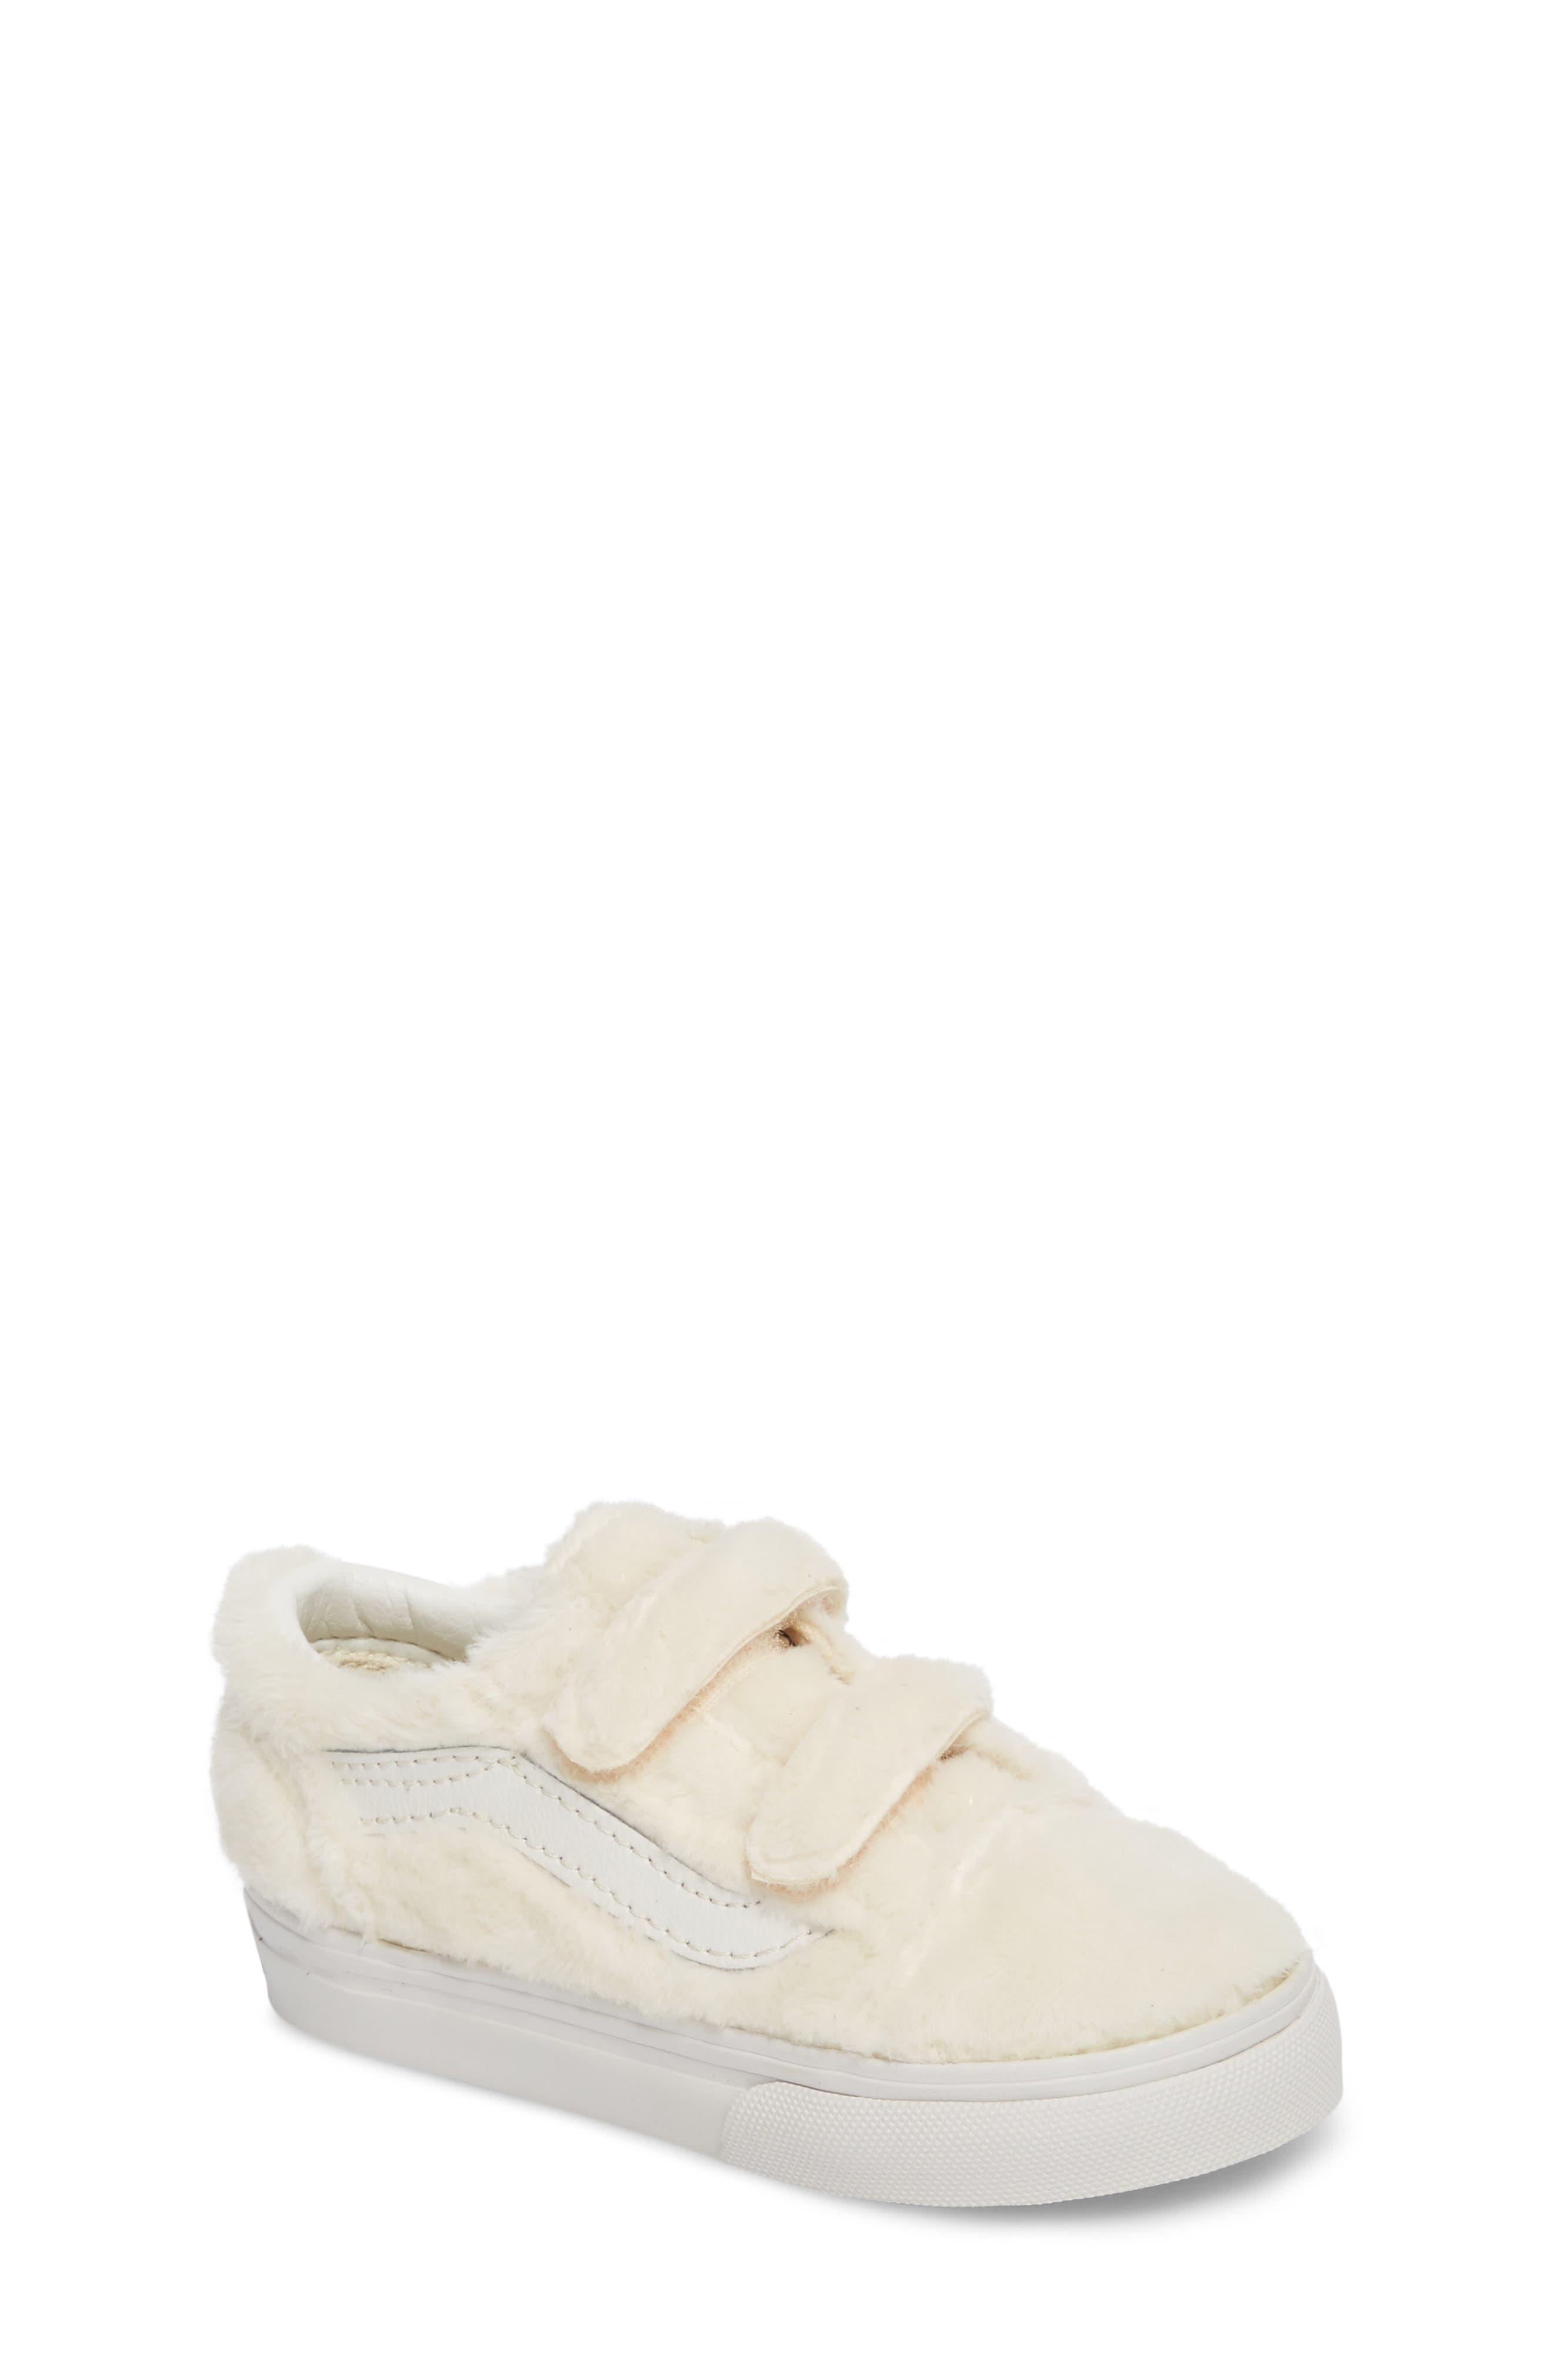 Old Skool V Faux Fur Sneaker,                             Main thumbnail 1, color,                             900